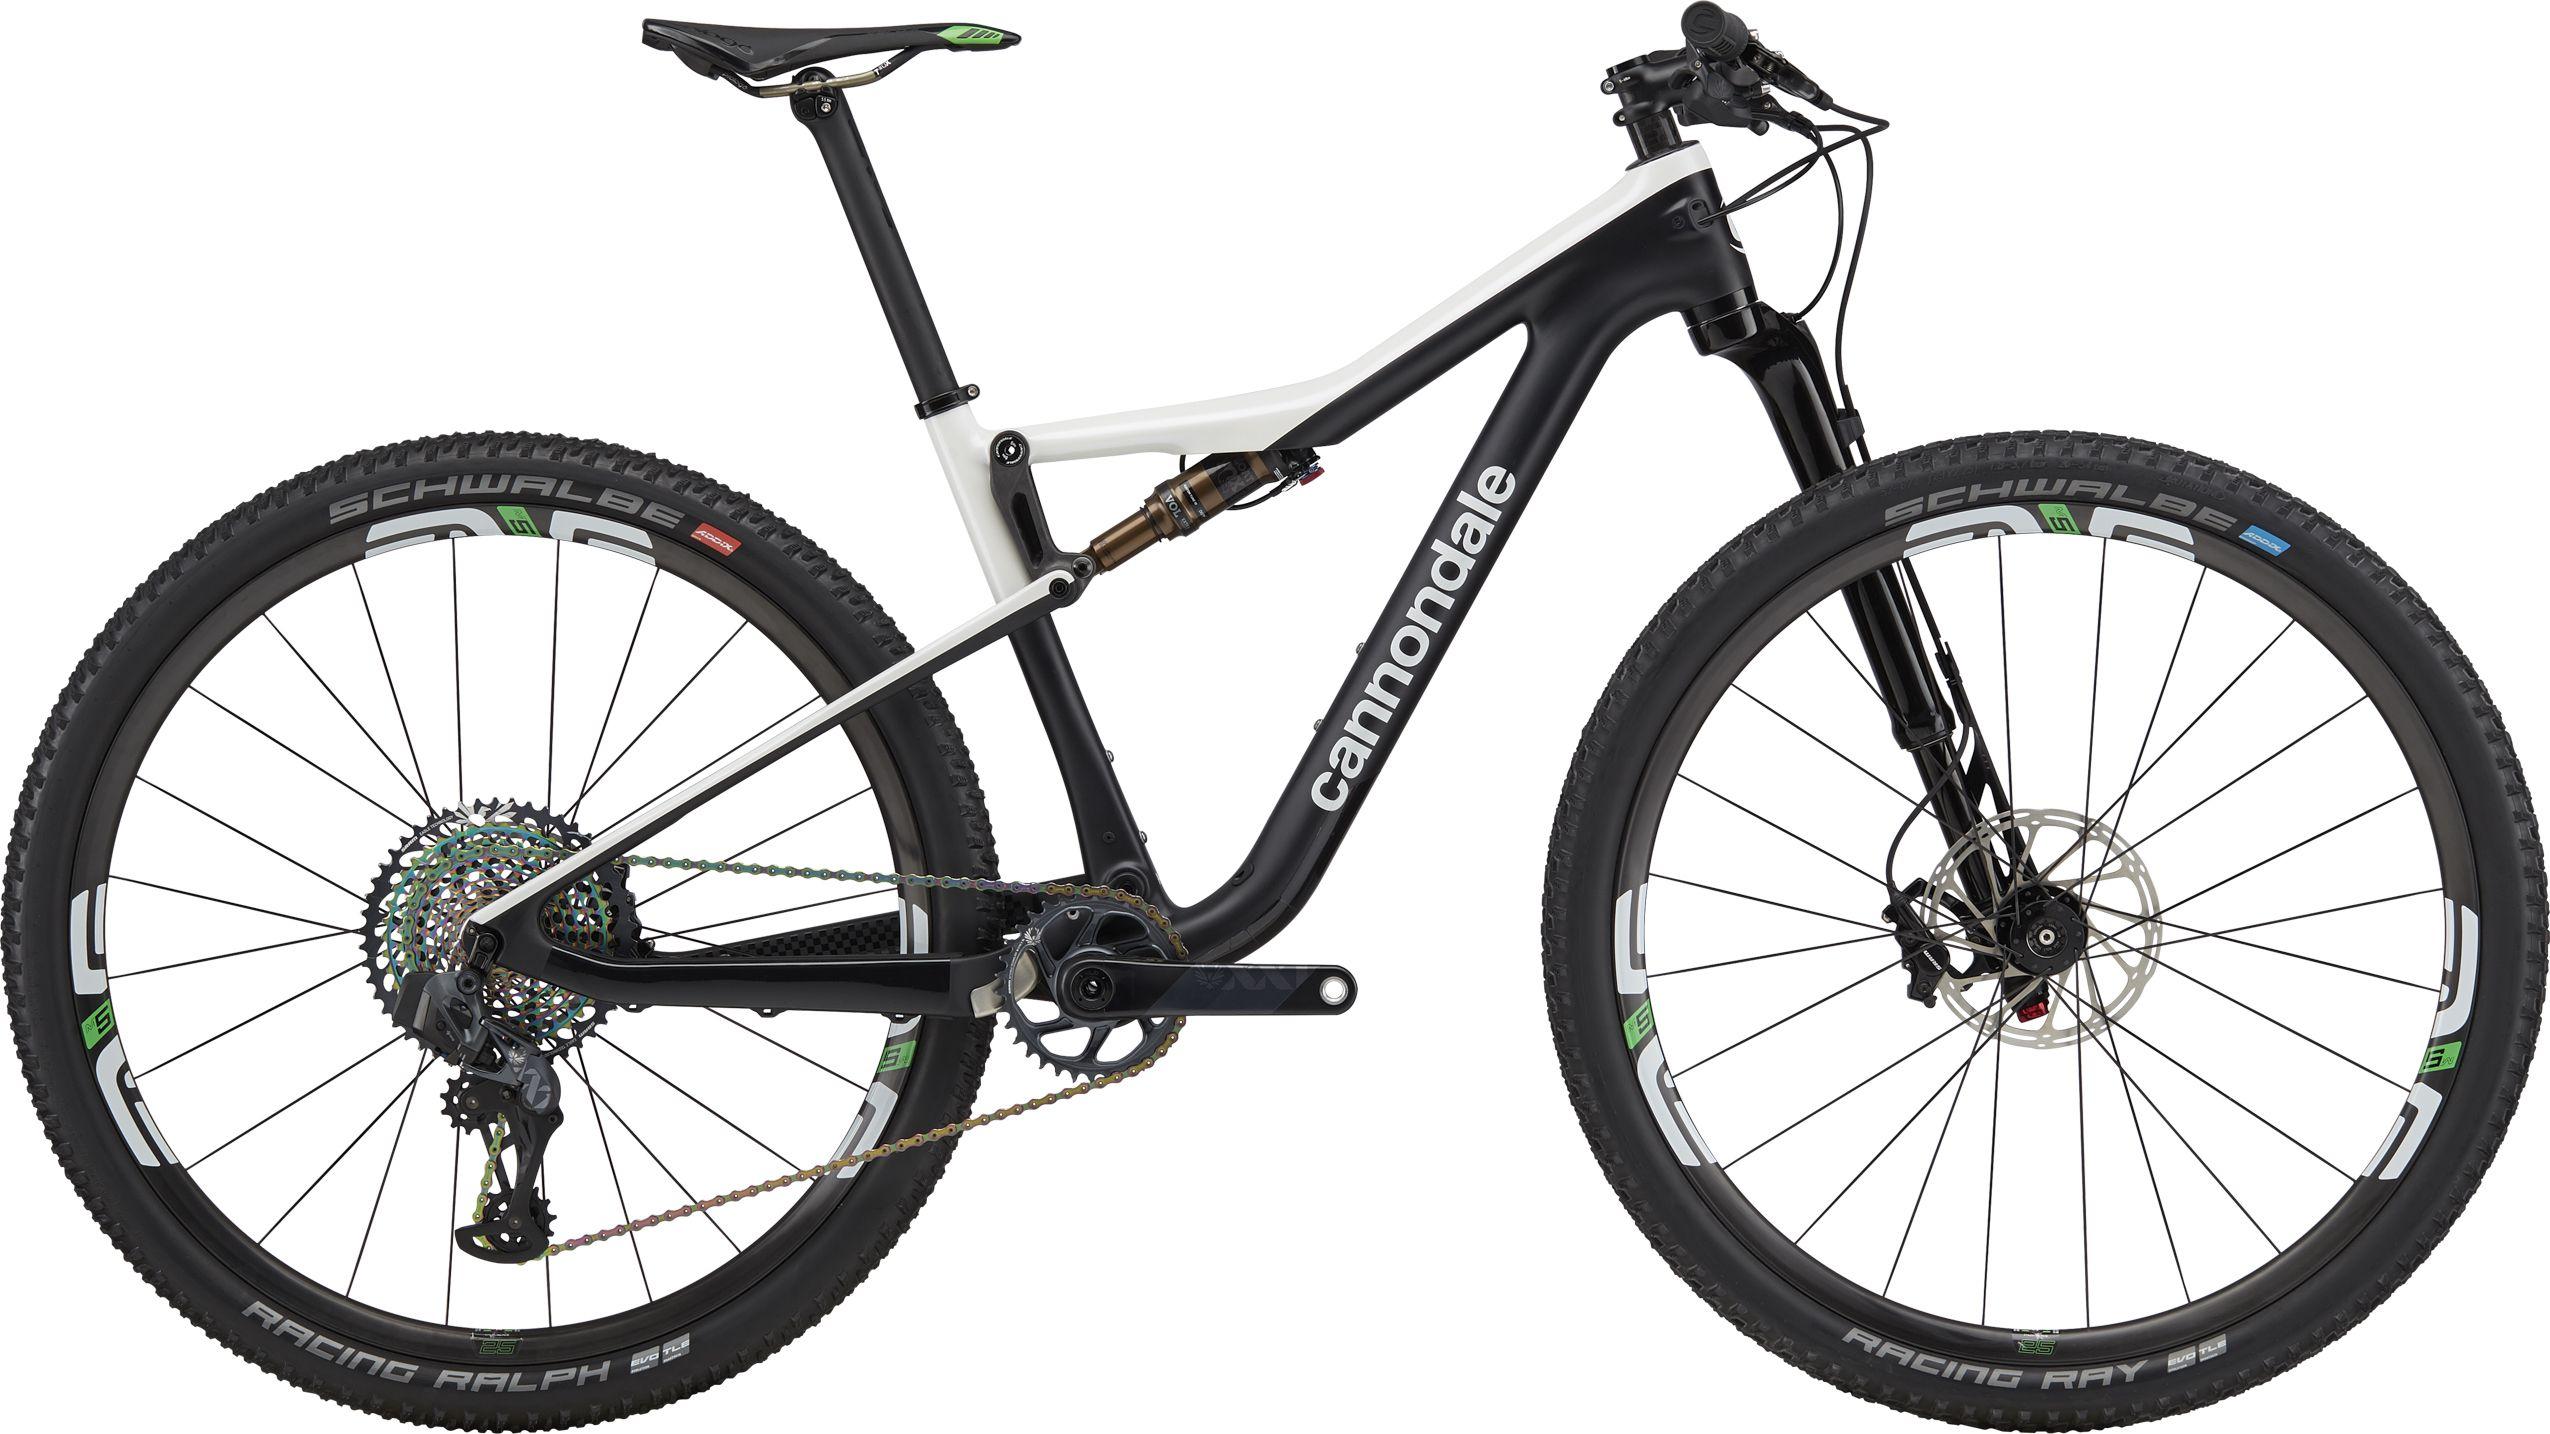 Cannondale Scalpel Si Hi-mod World Cup Edition Mountain Bike 2020 | Mountainbikes